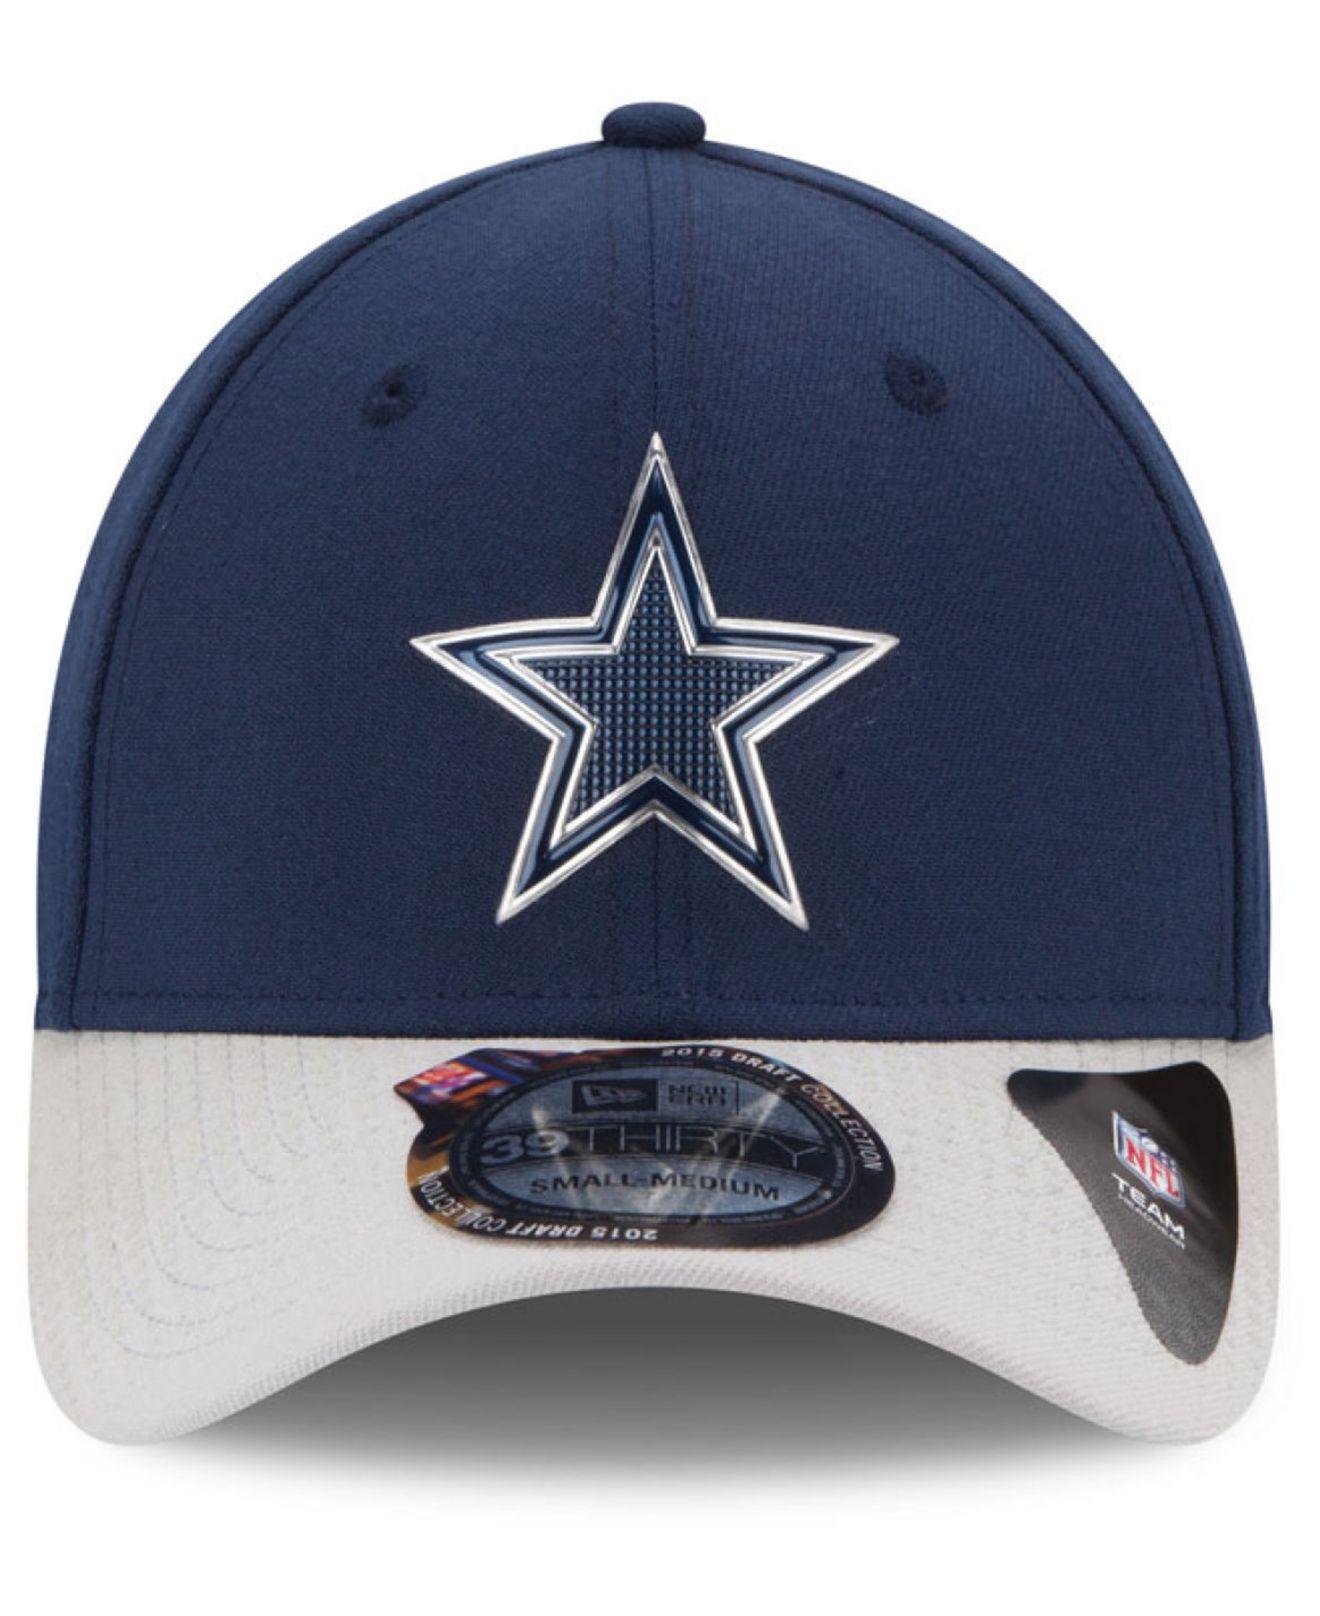 cheapest lyst ktz dallas cowboys 2015 nfl draft 39thirty cap in blue for  men d3dd9 b3df8 a1a1982dcac